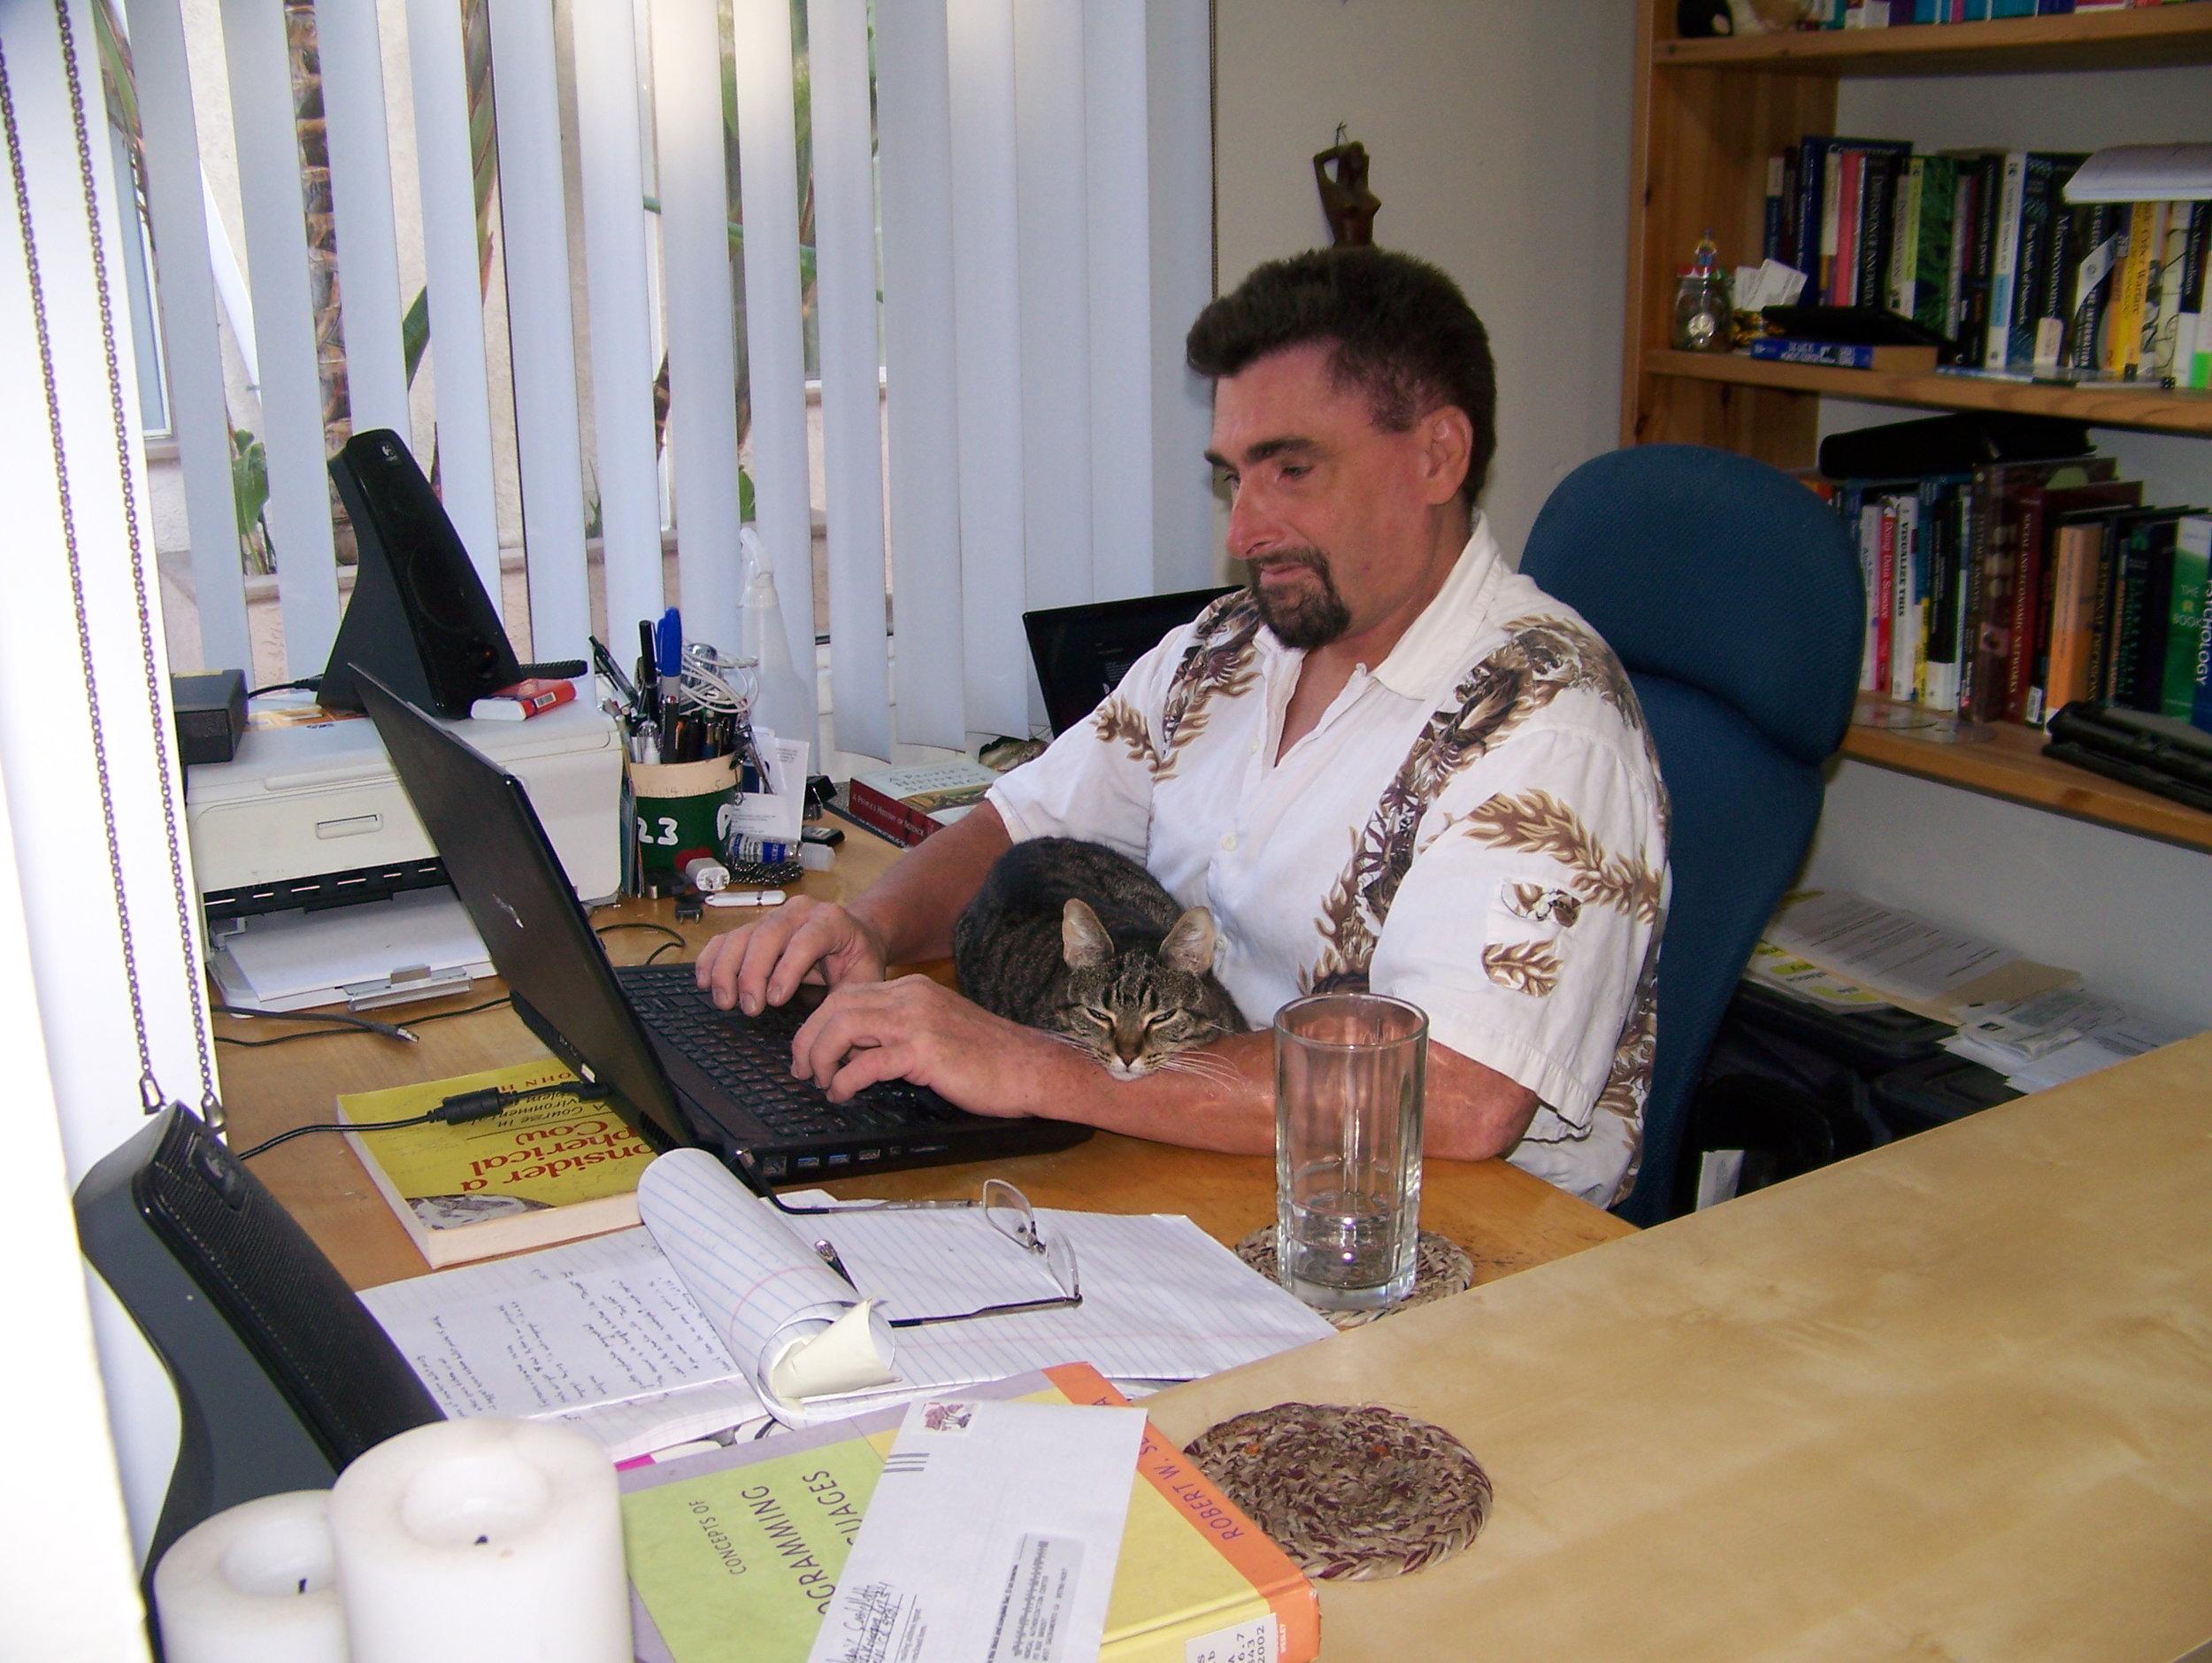 Tony Castalletto, AB 1755 Research